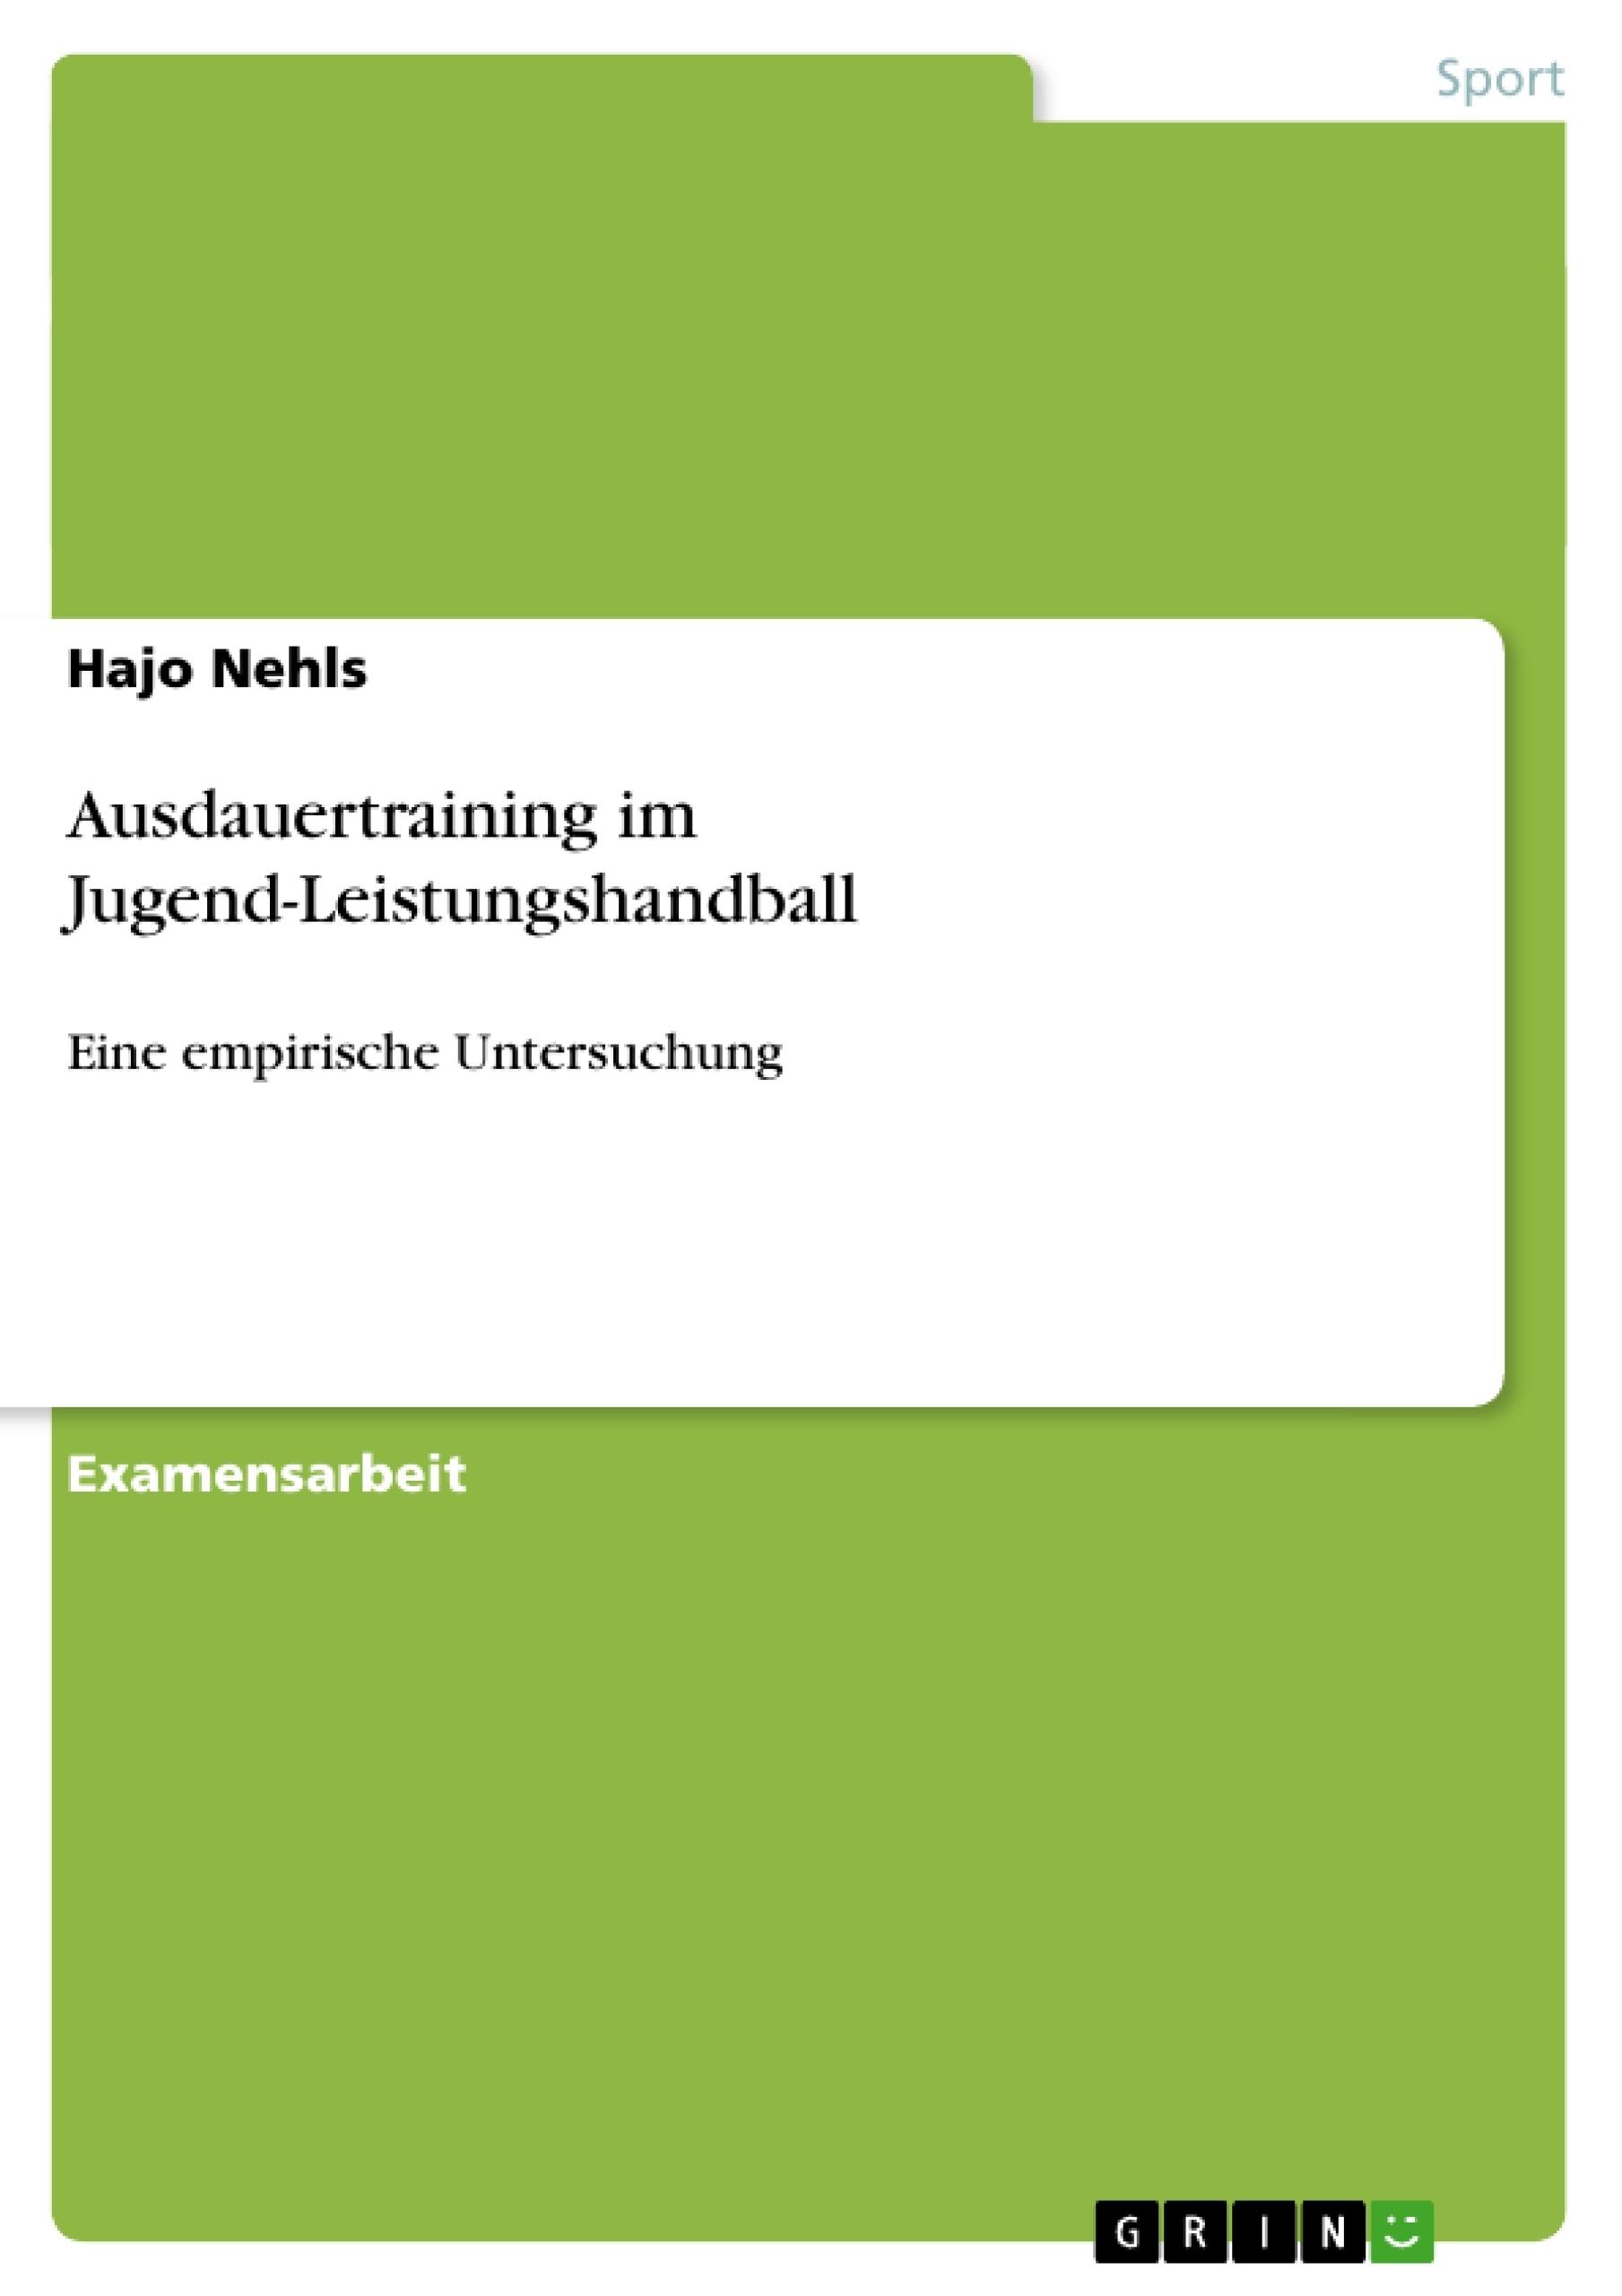 Titel: Ausdauertraining im Jugend-Leistungshandball